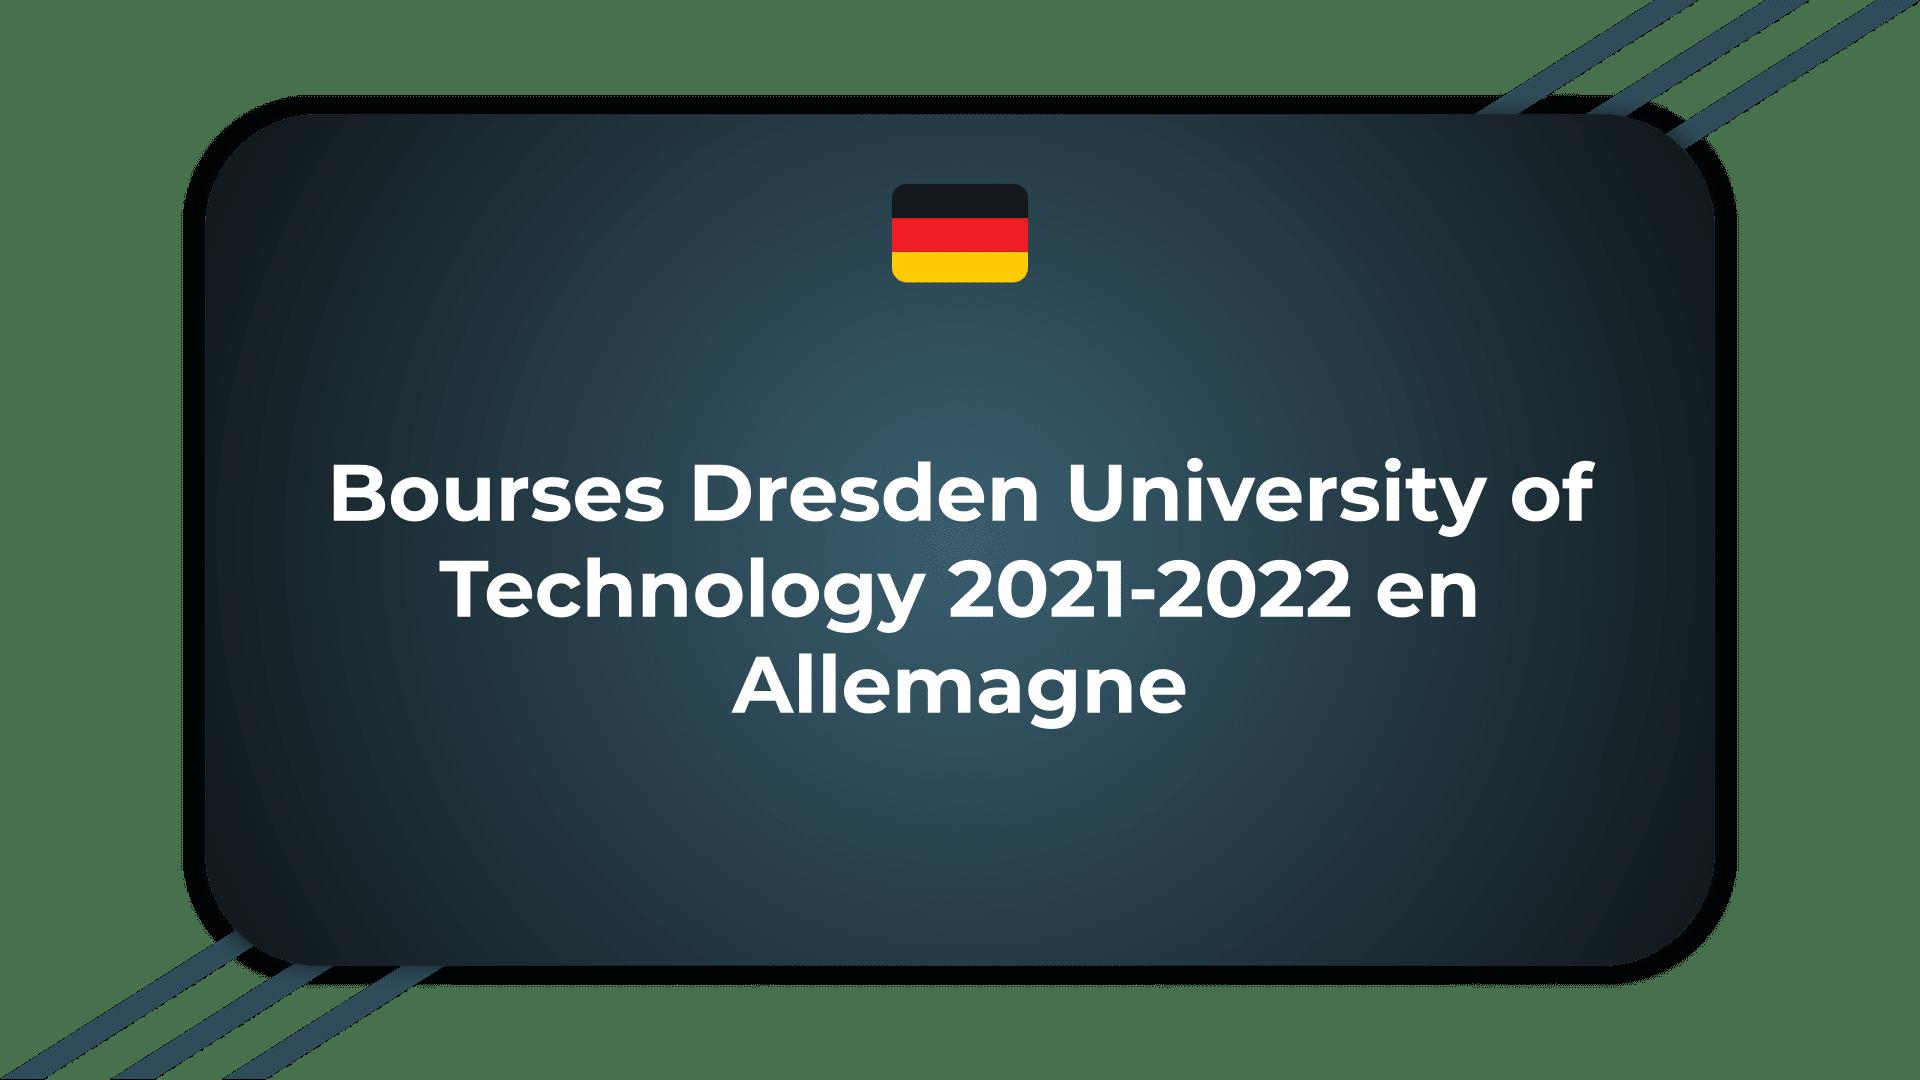 Bourses Dresden University of Technology